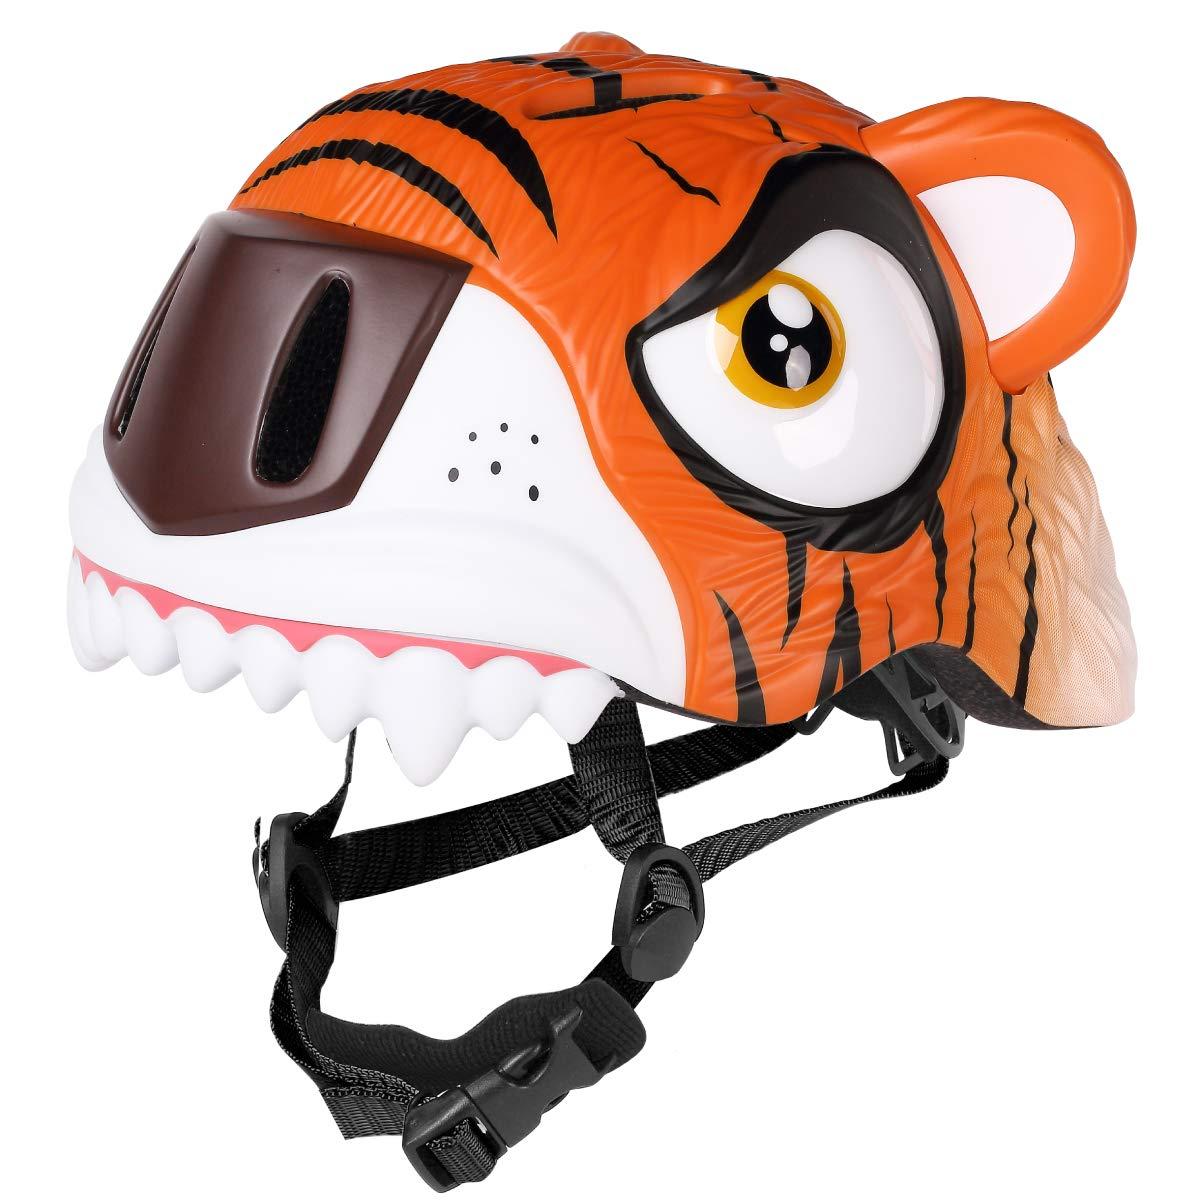 M Merkapa Kids Bike Helmet Adjustable 3D Shark Bicycle Helmets for Toddler and Youth (Tiger)